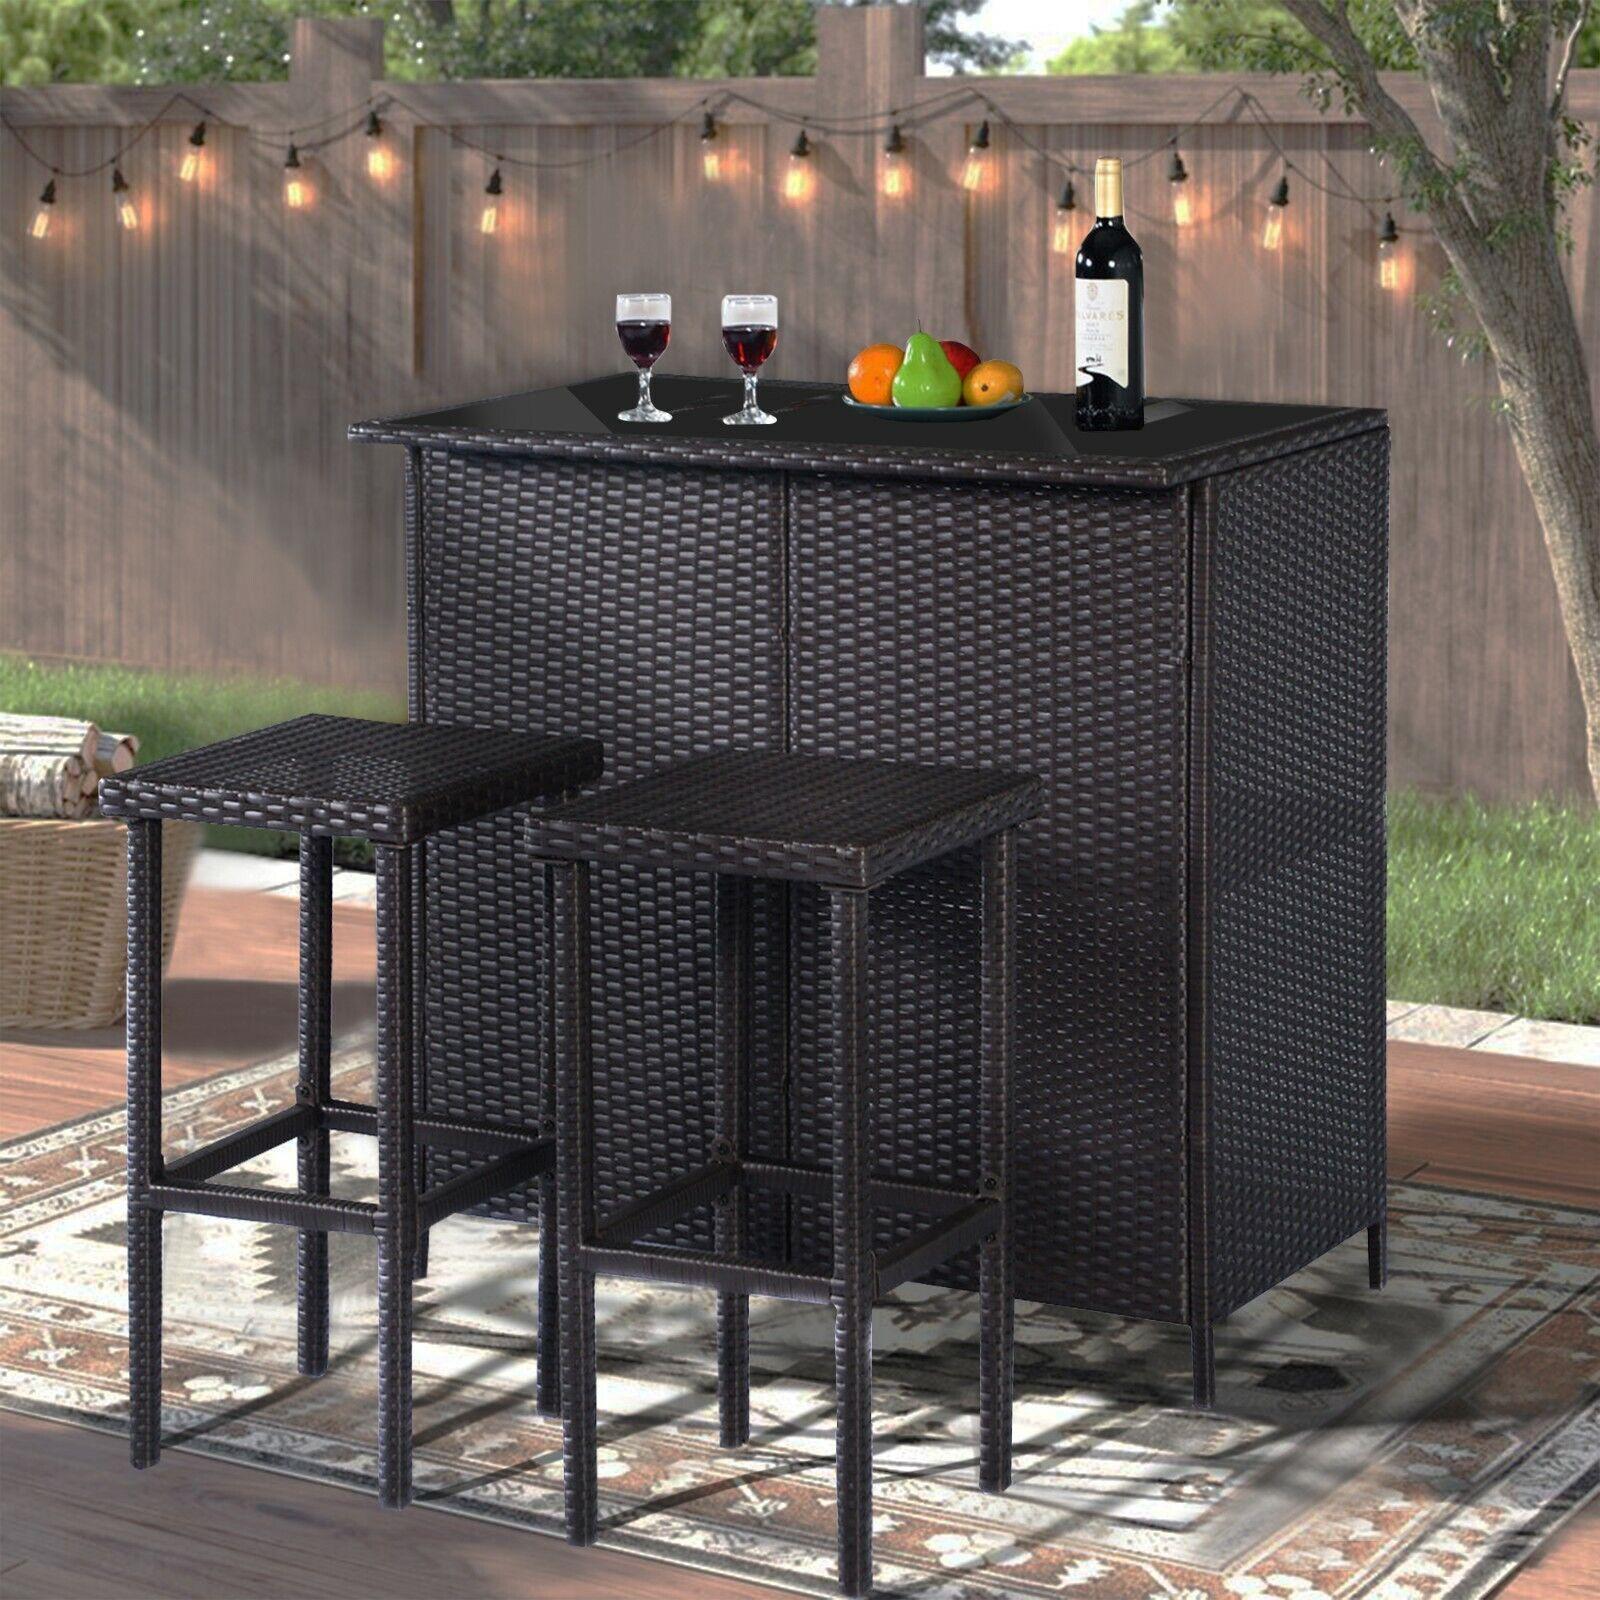 3 PCS Black Wicker Bar Set Patio Outdoor Table & 2 Stools